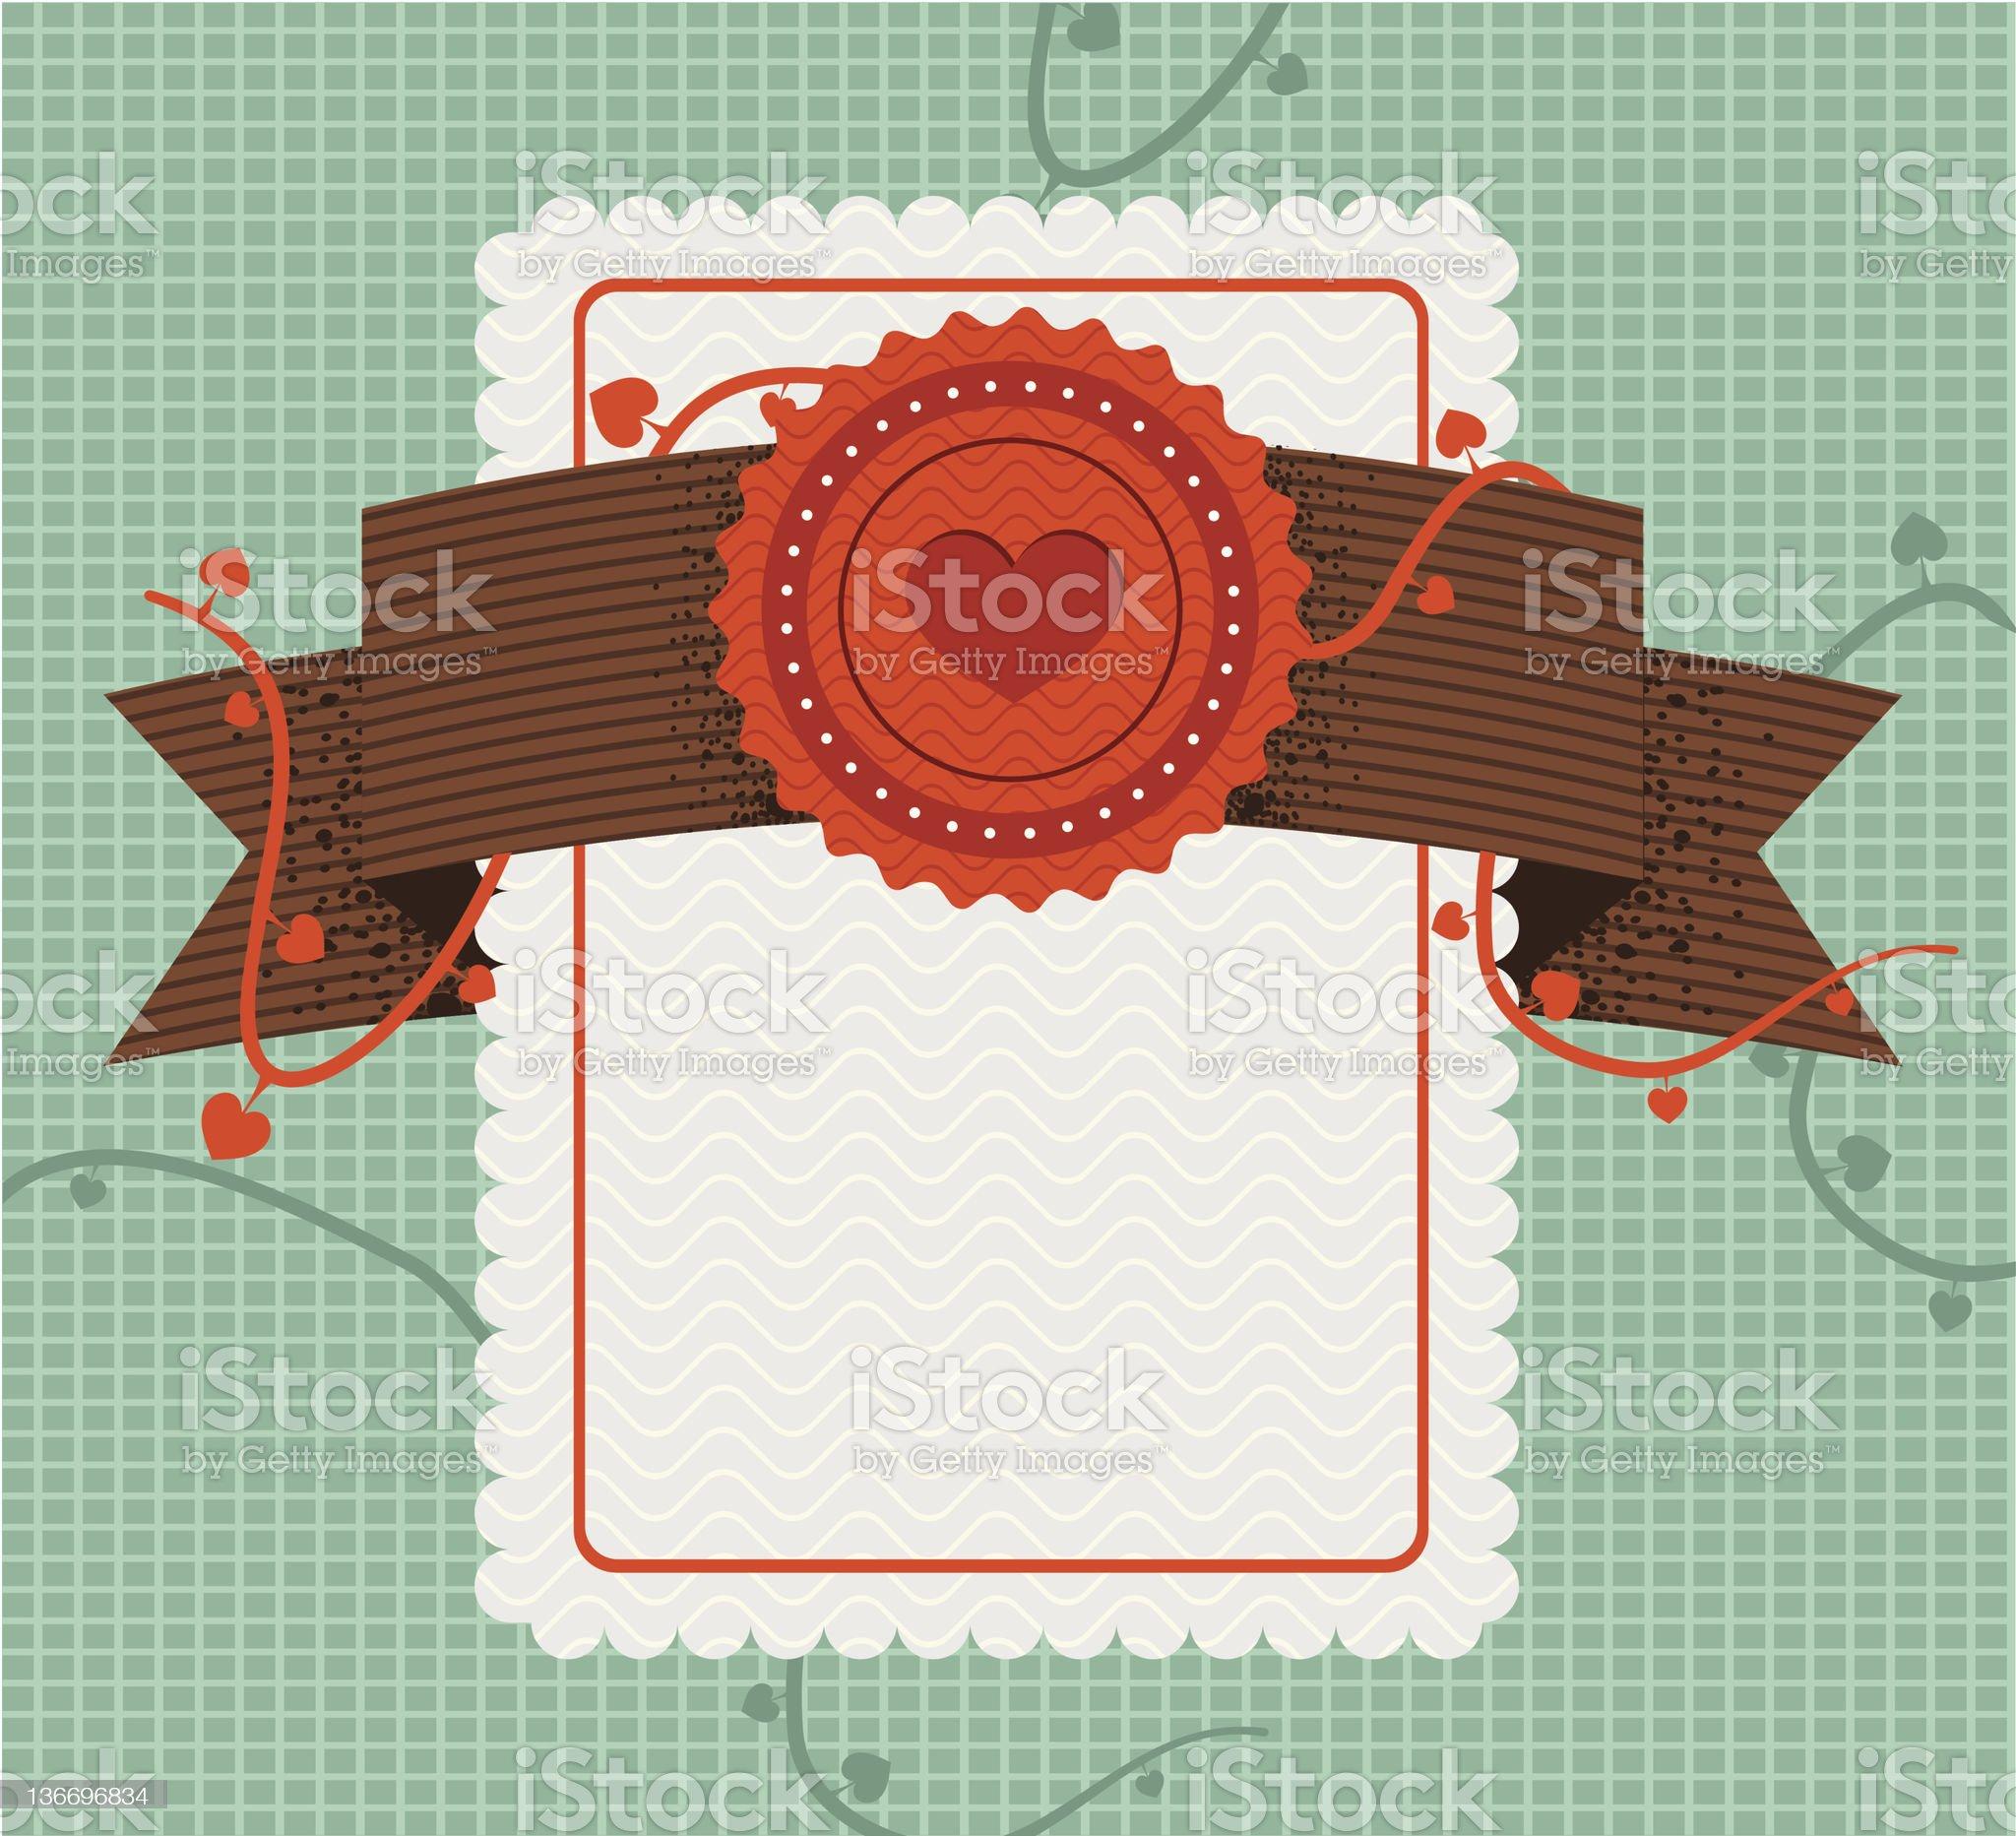 retro style love card royalty-free stock vector art